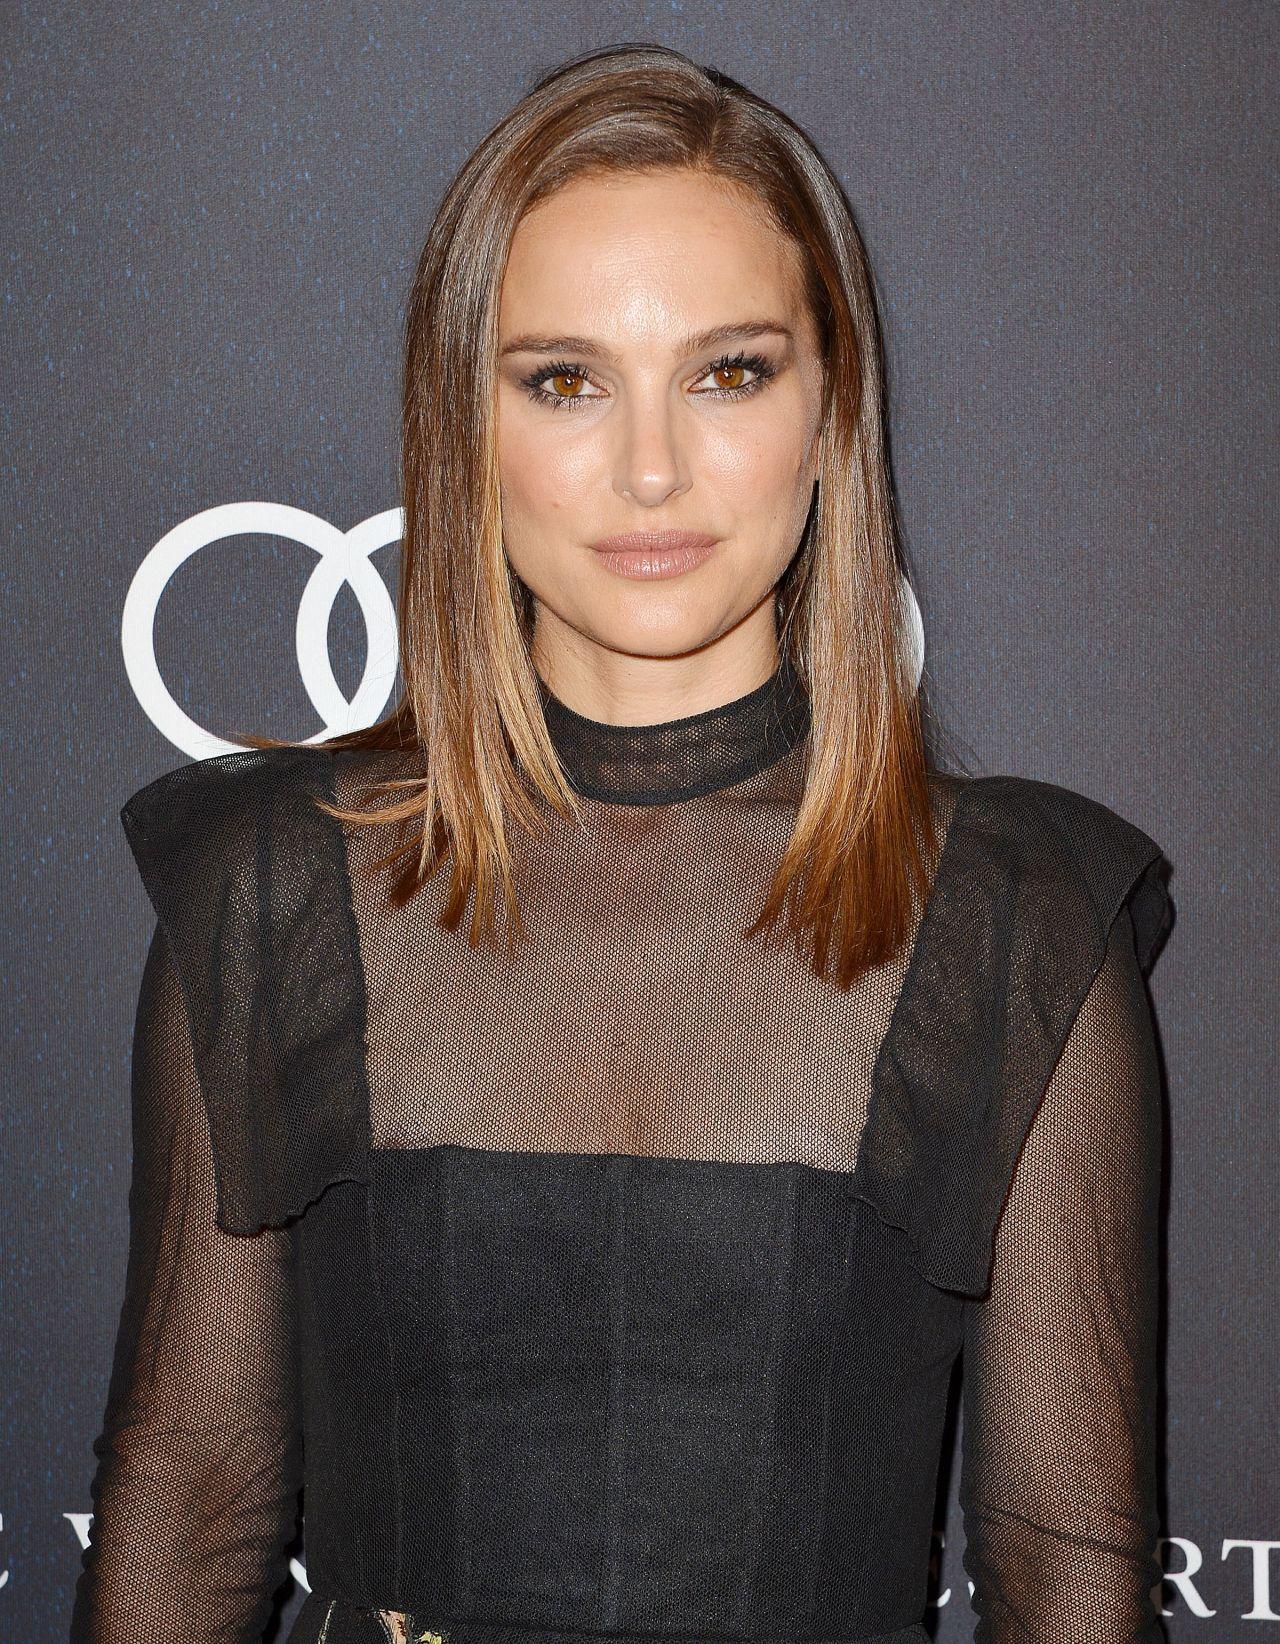 Natalie Portman – 2018 Variety's Power Of Women Natalie Portman